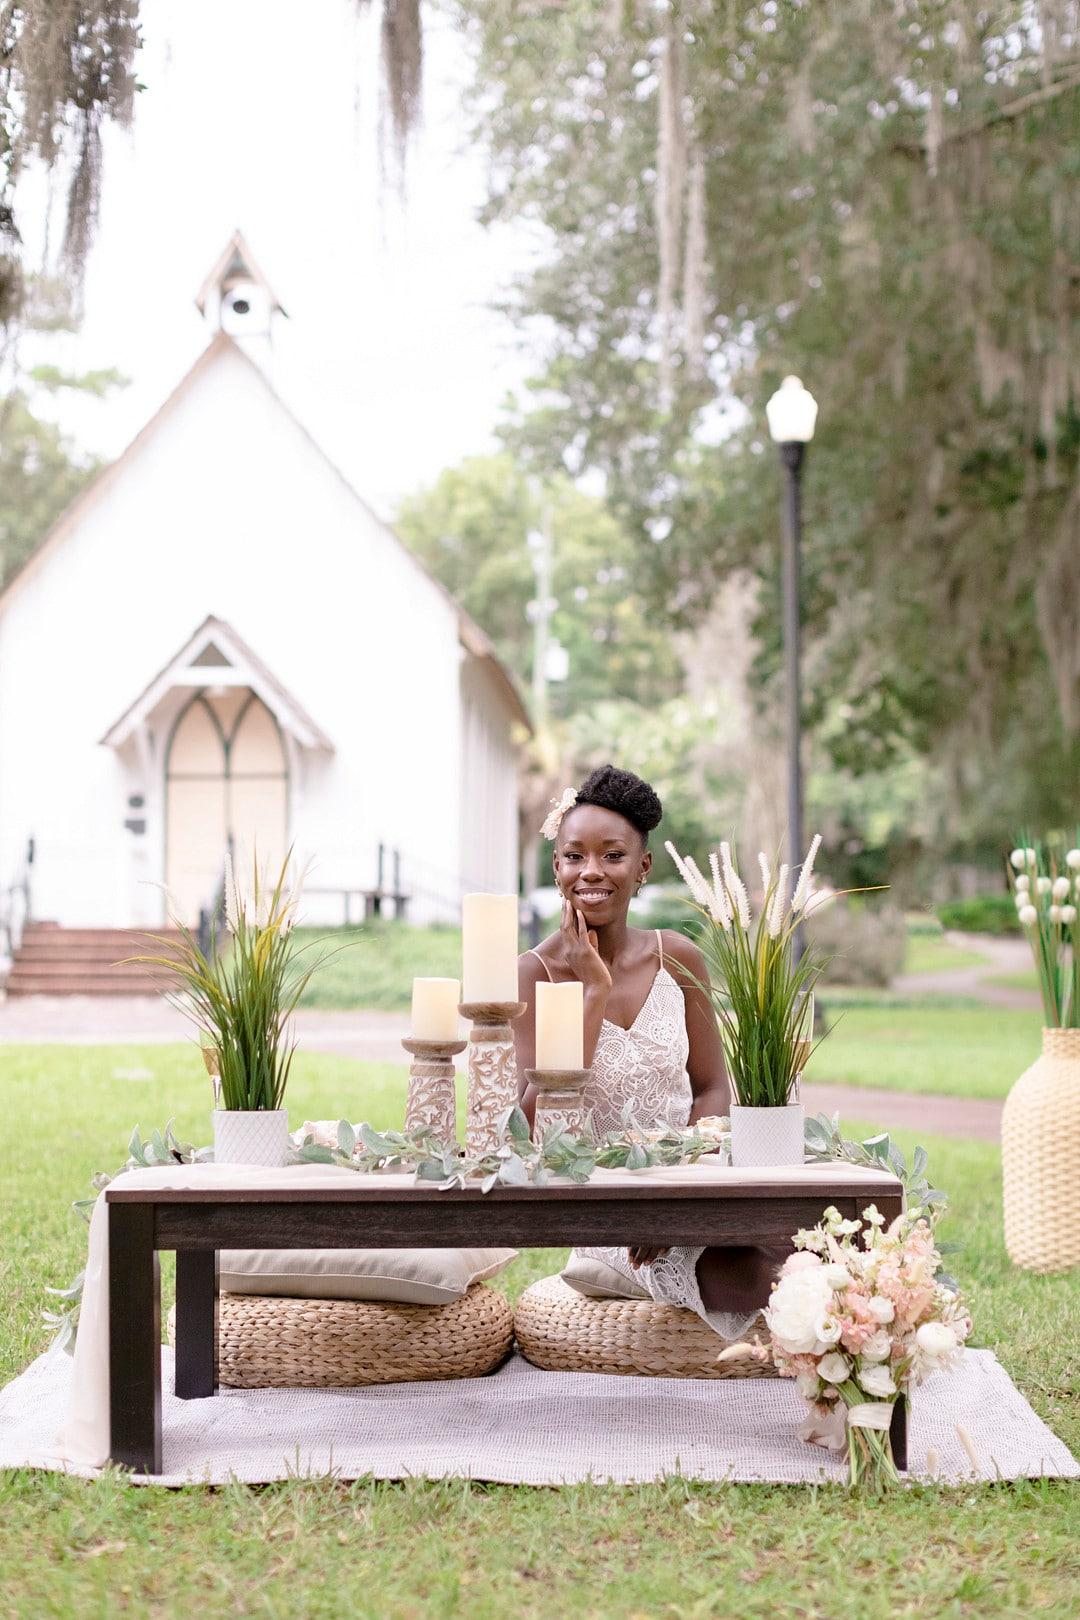 Elegant Boho Wedding Picnic_Susan Dixon Photography, LLC_susan-dixon-033_low